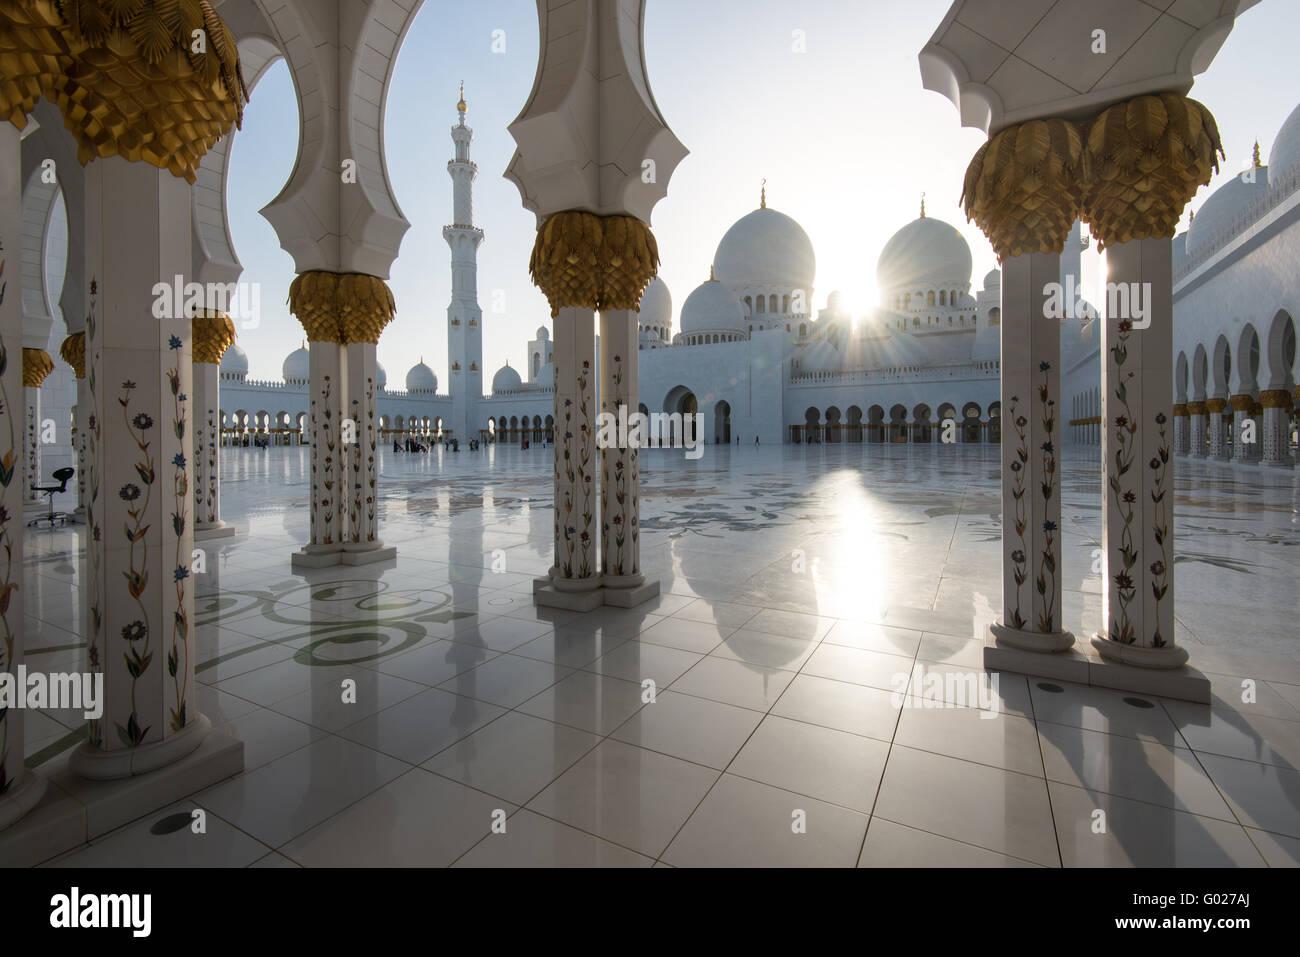 Abu Dhabi Sheikh Zayed Grande moschea. Immagini Stock